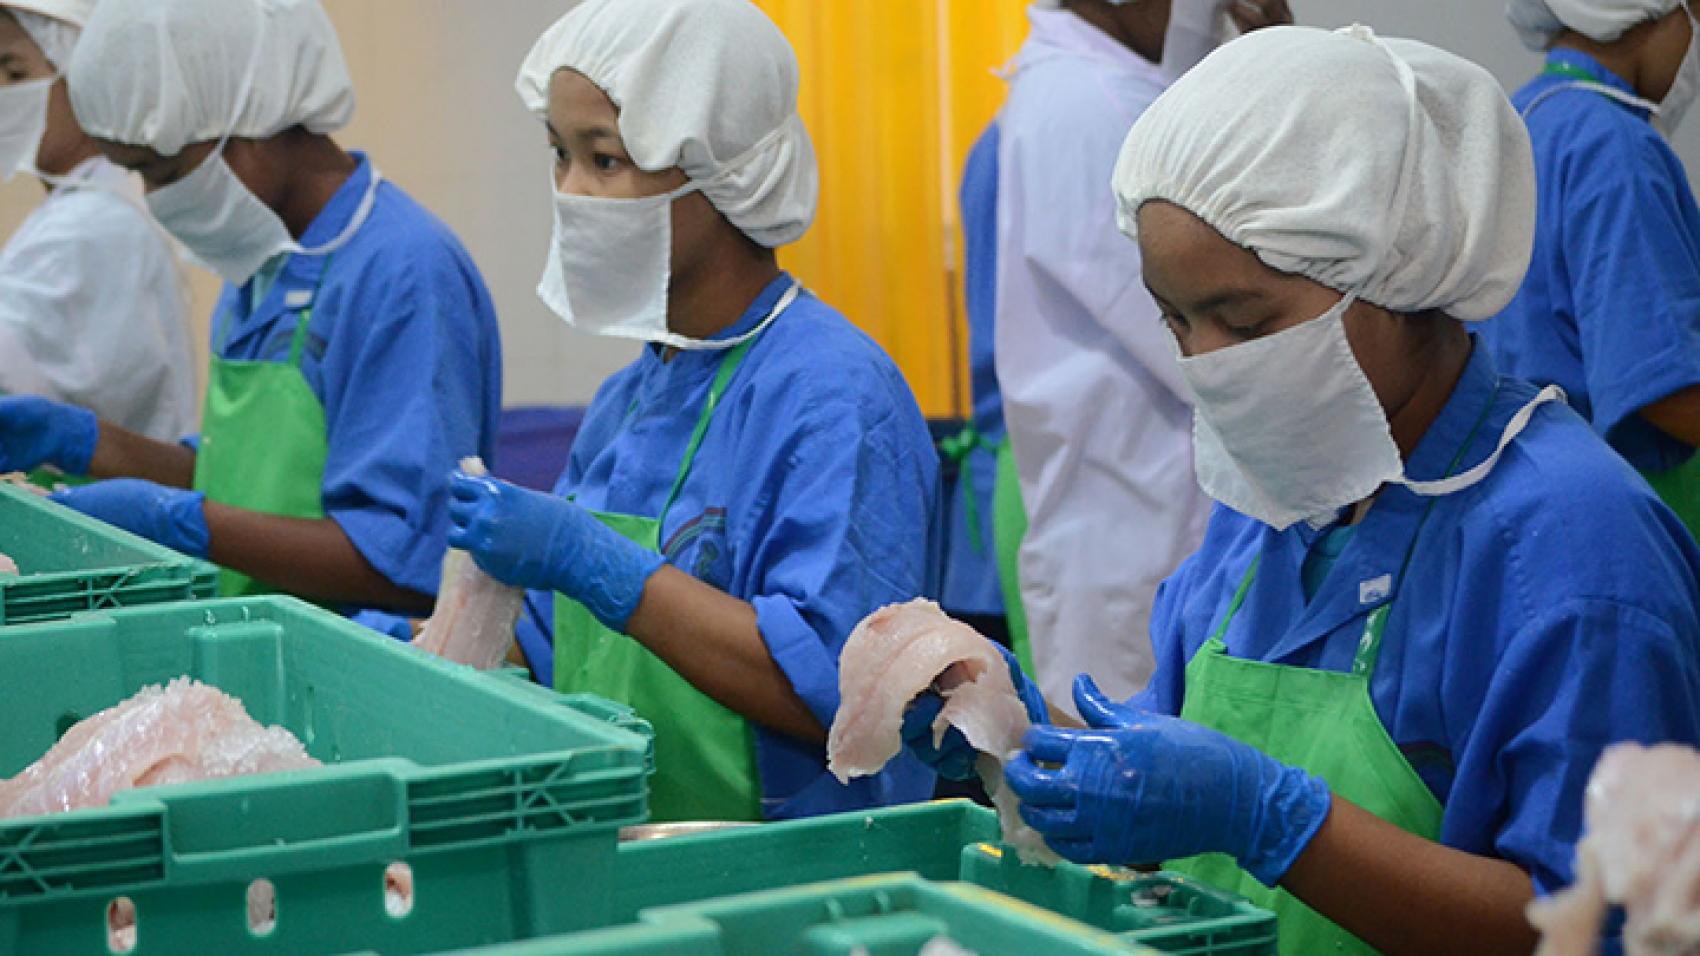 Fishery exports cross $700 mln